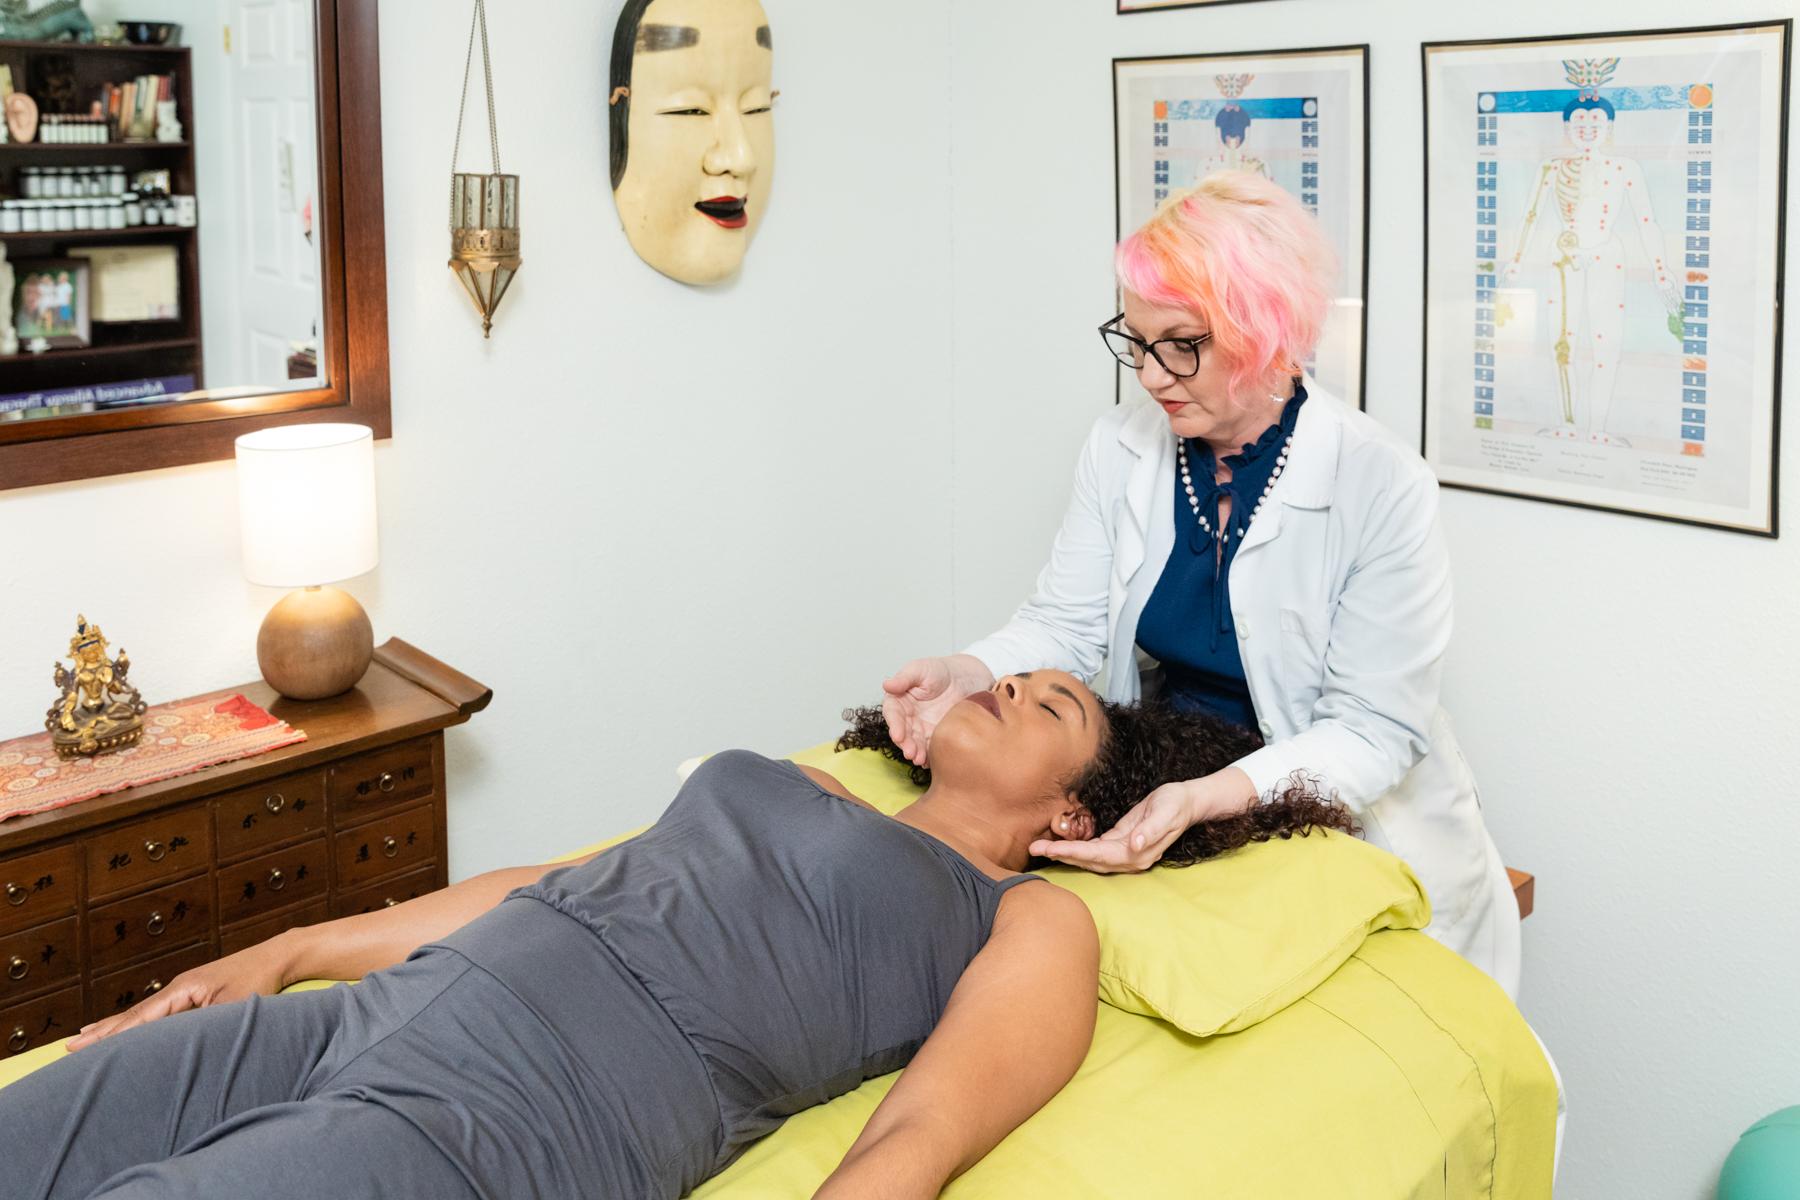 Kymberlie Landgraf Lac works on an acupuncture patient